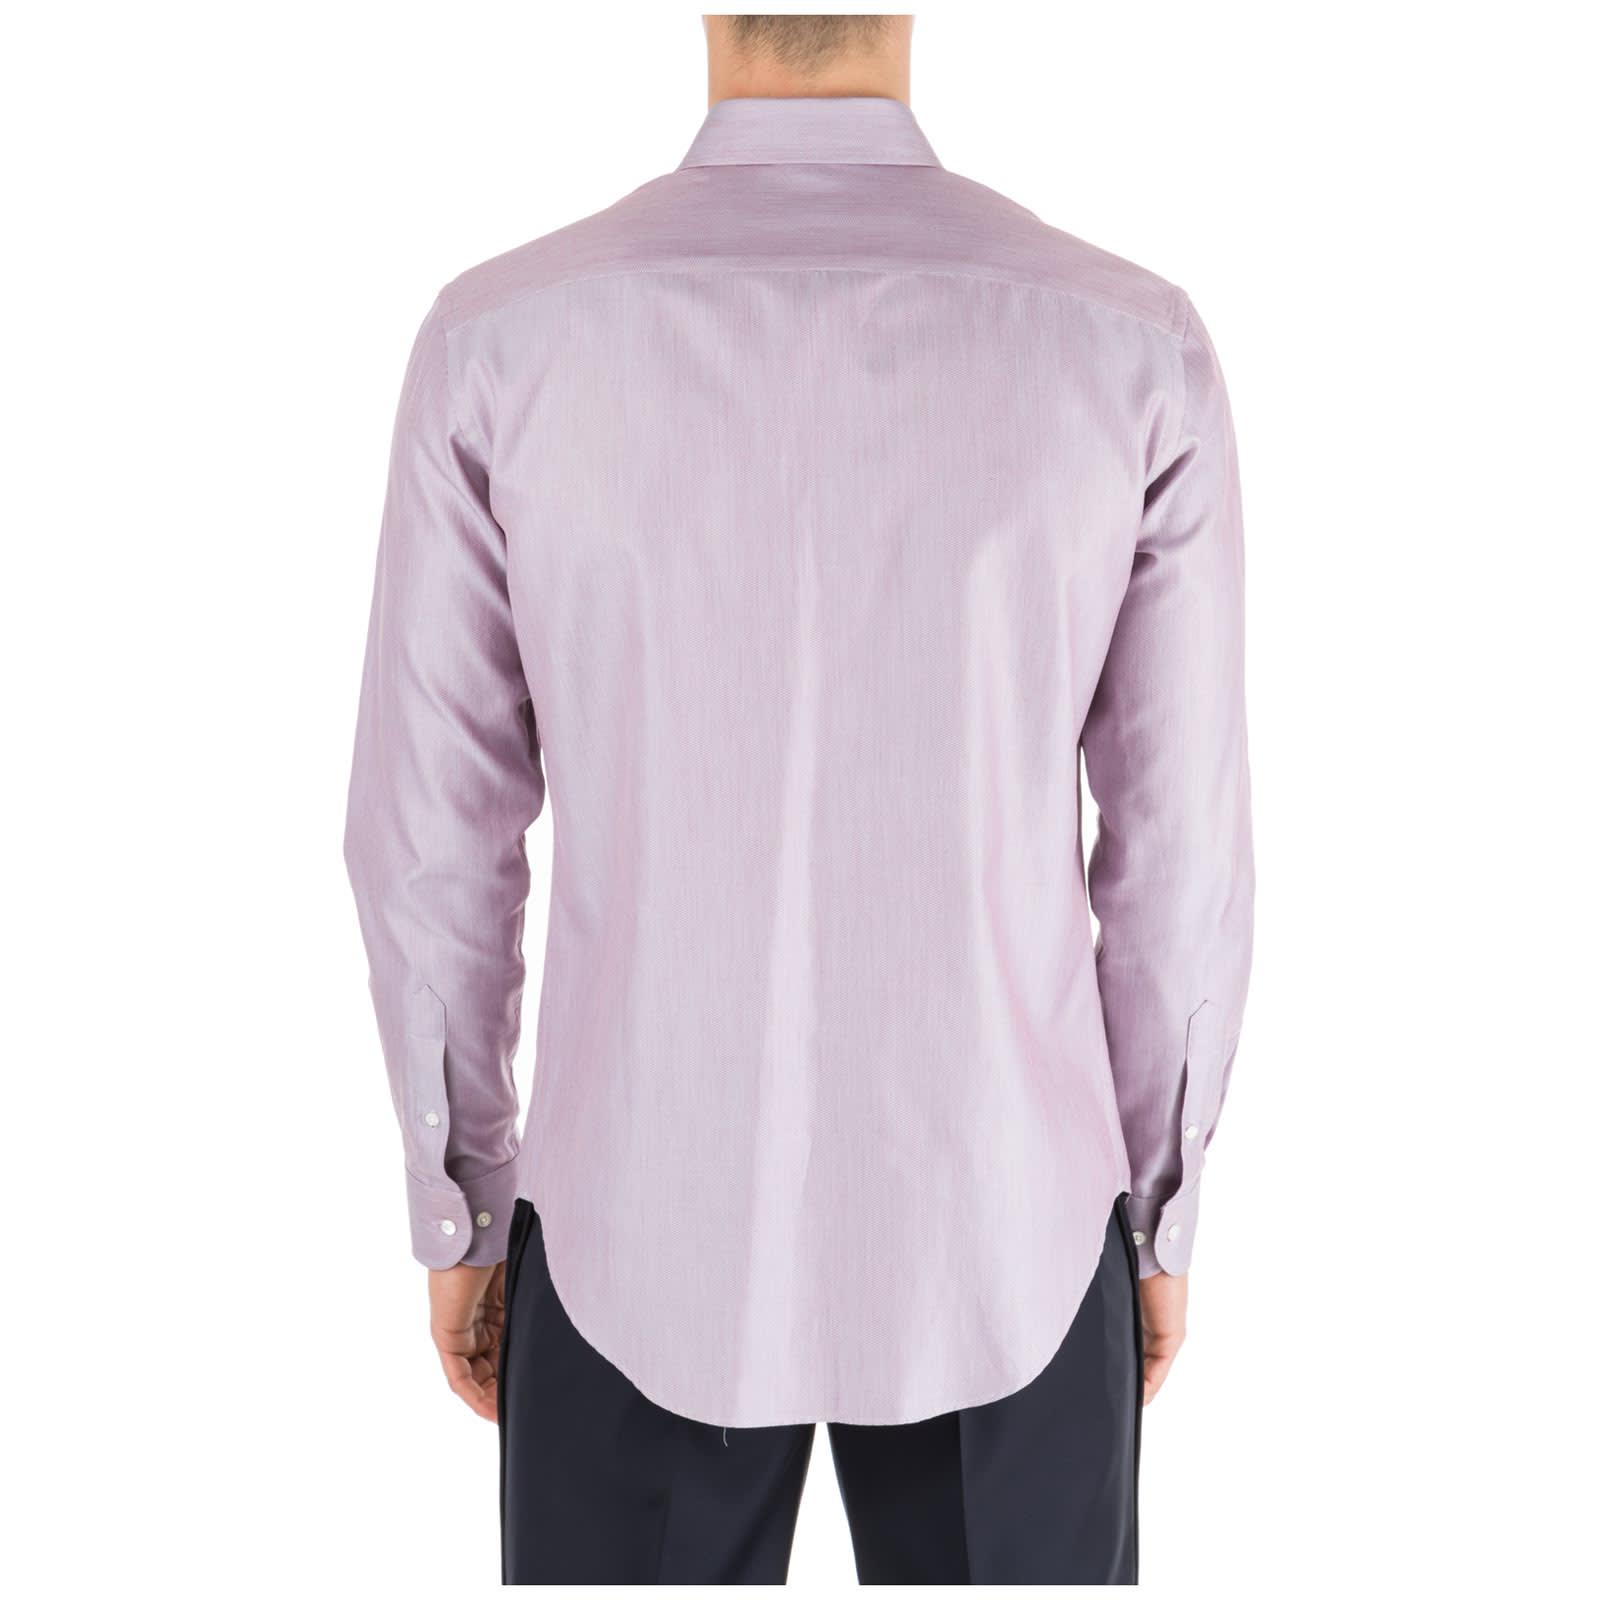 cheap for discount dd3b6 f050f Best price on the market at italist   Emporio Armani Emporio Armani  Herrenhemd Hemd Herren Langarm Langarmhemd Modern Fit